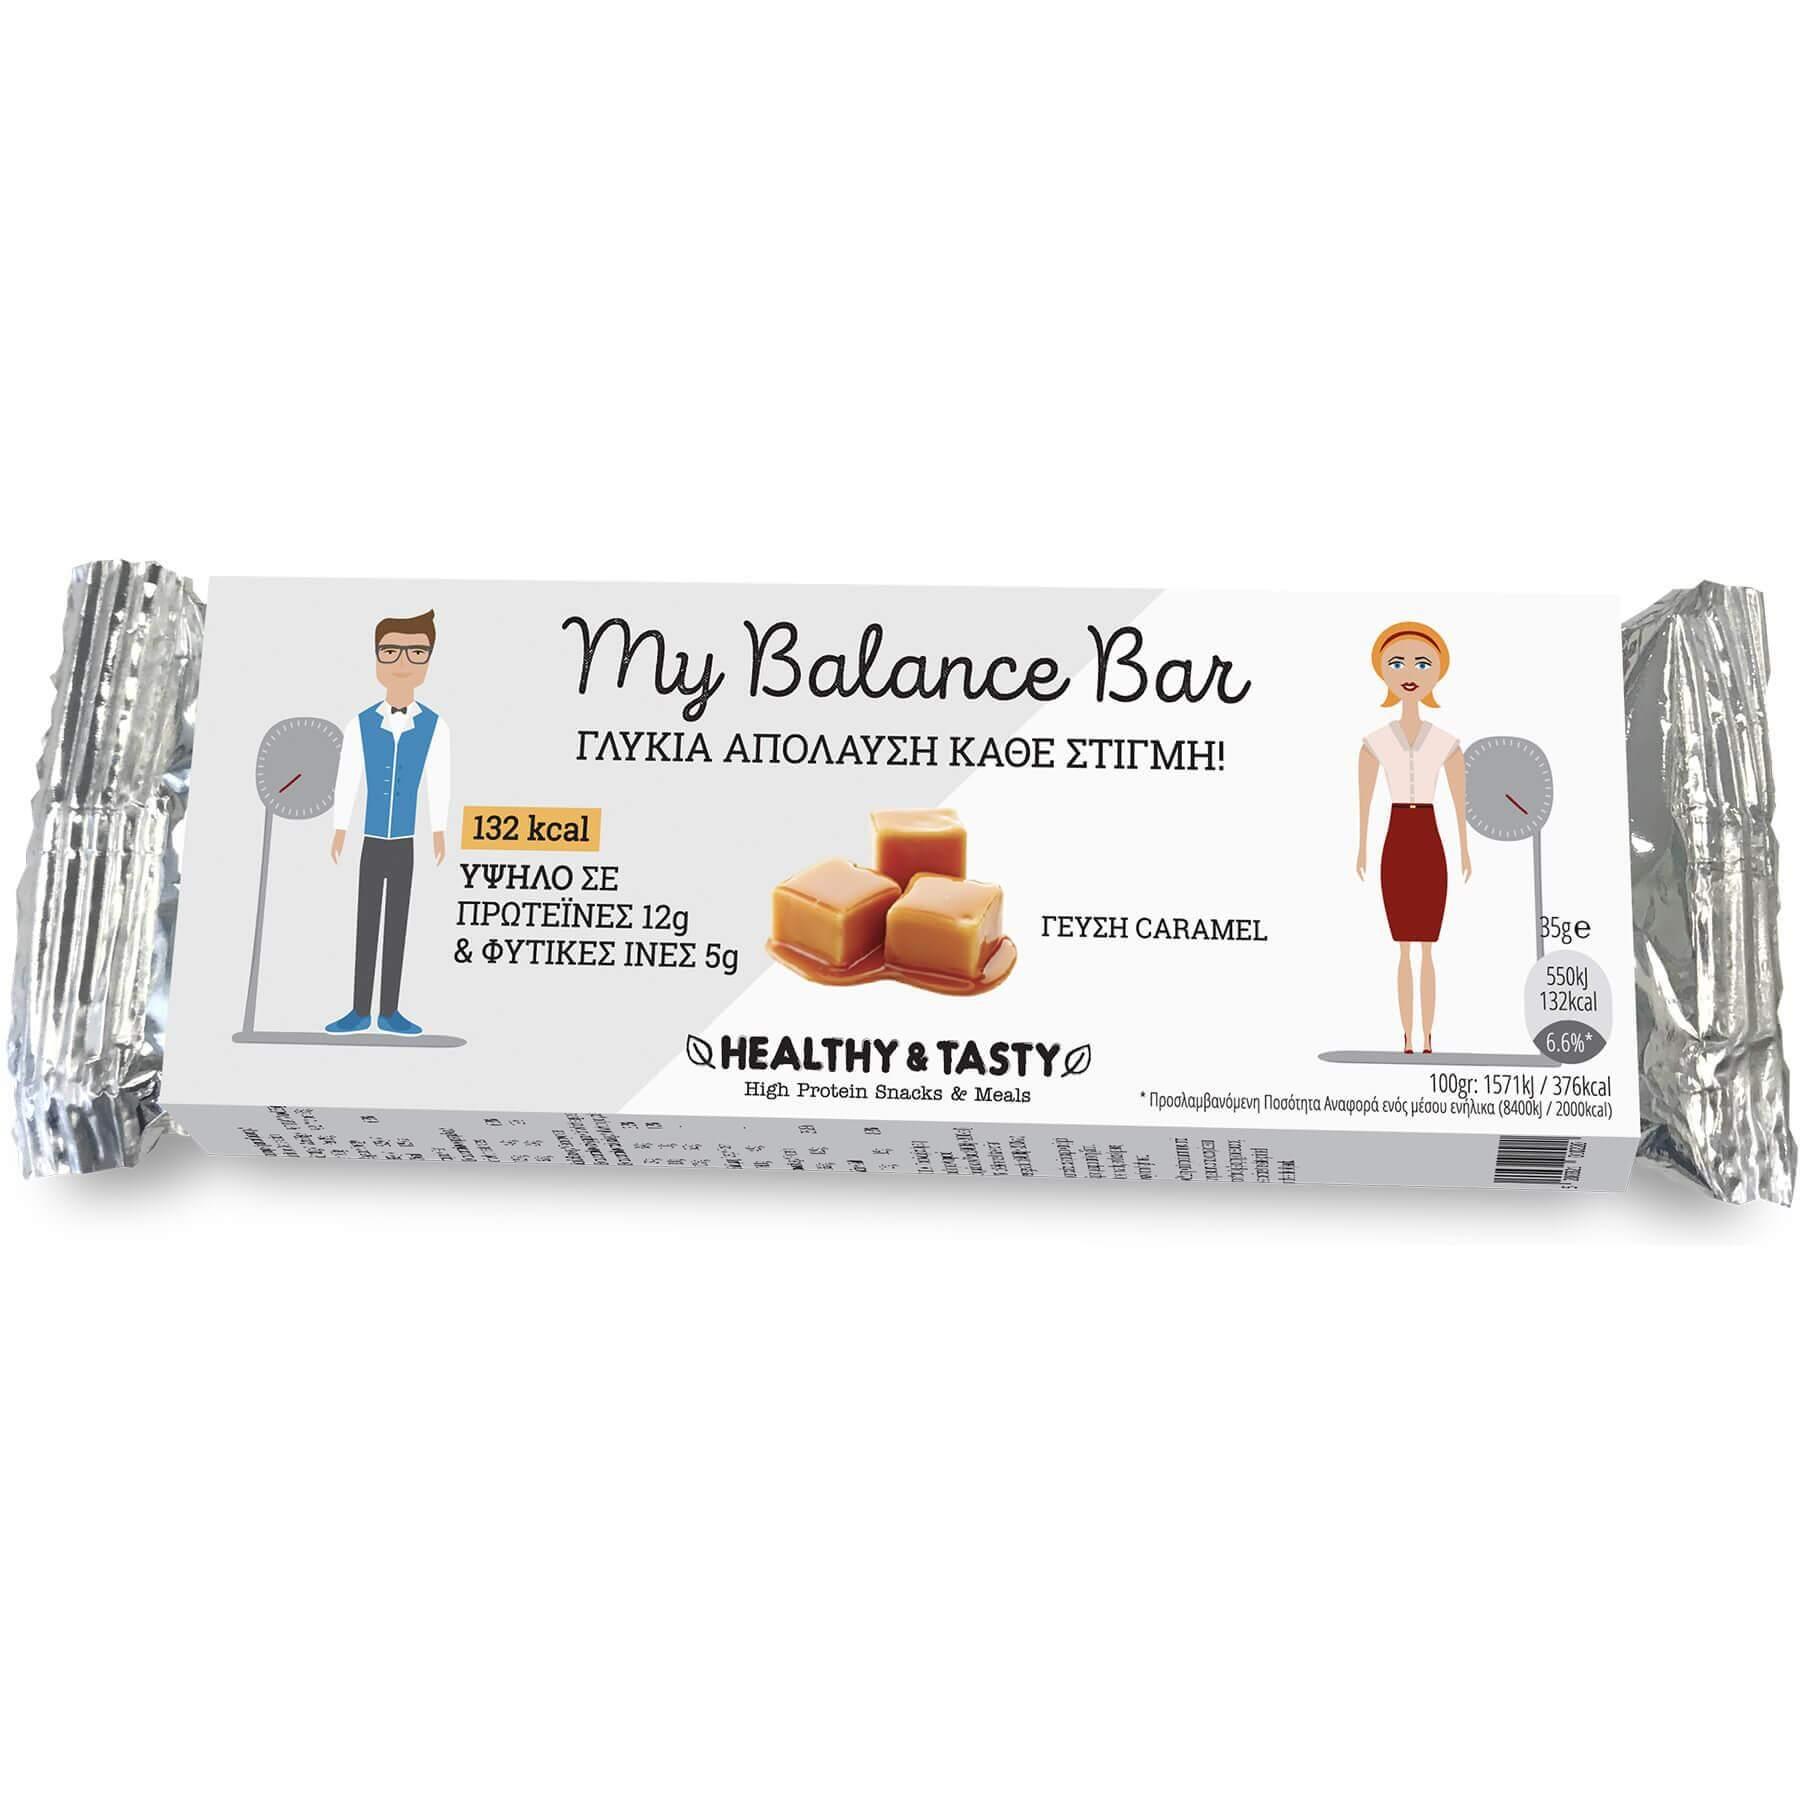 Power Health My Balance Bar Γλυκιά Απόλαυση Κάθε Στιγμή Πλούσια σε Πρωτεΐνες & Φυτικές Ίνες με Γεύση Caramel 35gr 20338